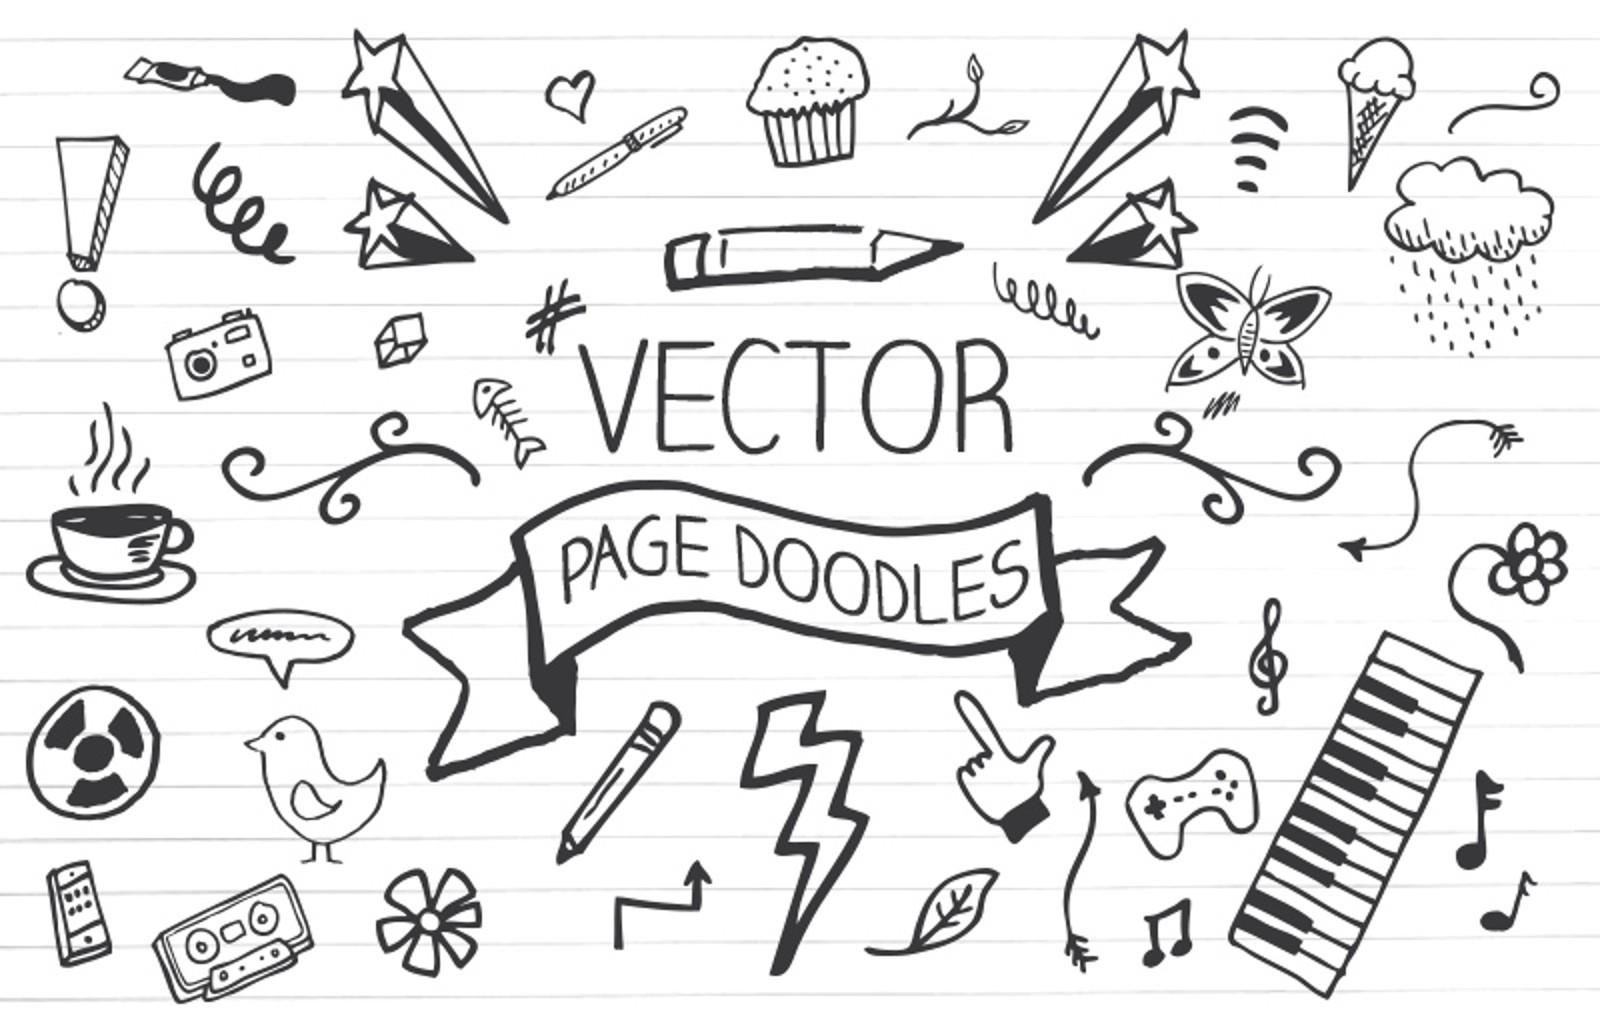 vector page doodles medialoot